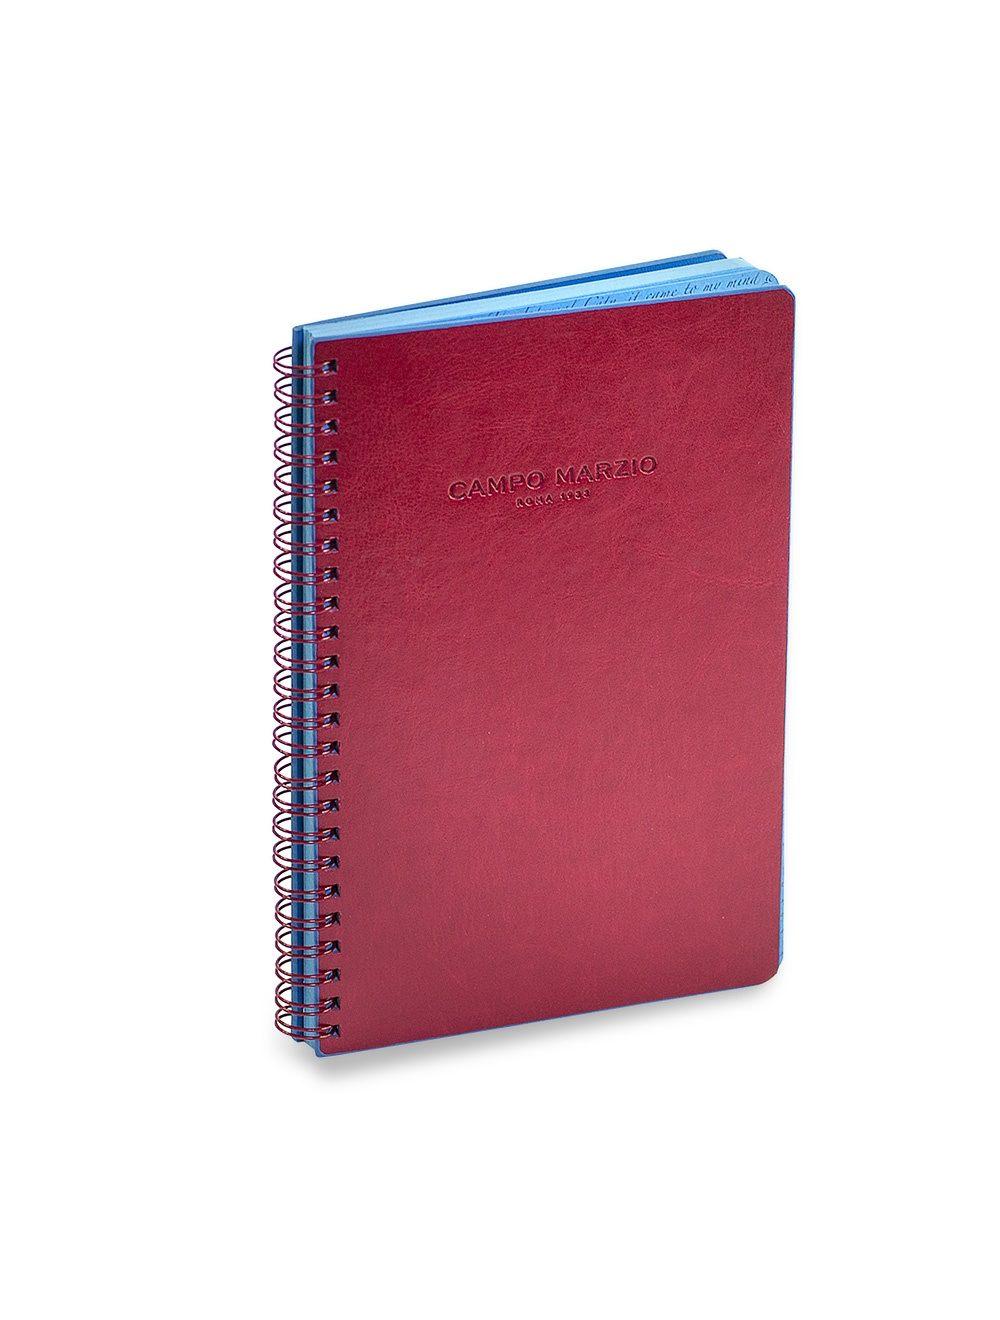 Spiral Bound Notes A4 - Cherry Red